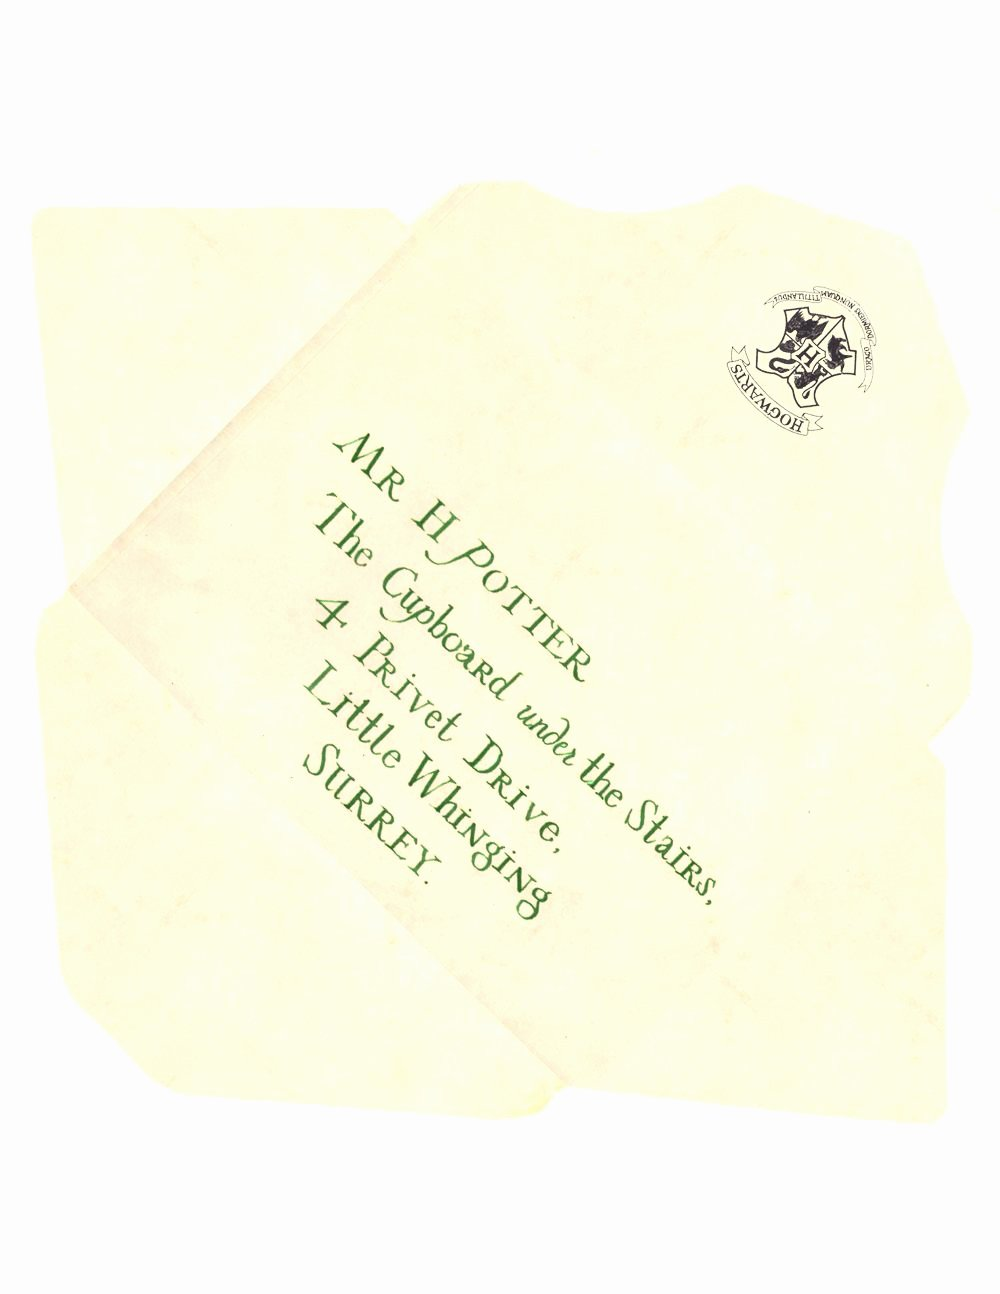 Harry Potter Acceptance Letter Template Luxury Harry Potter Envelope Template